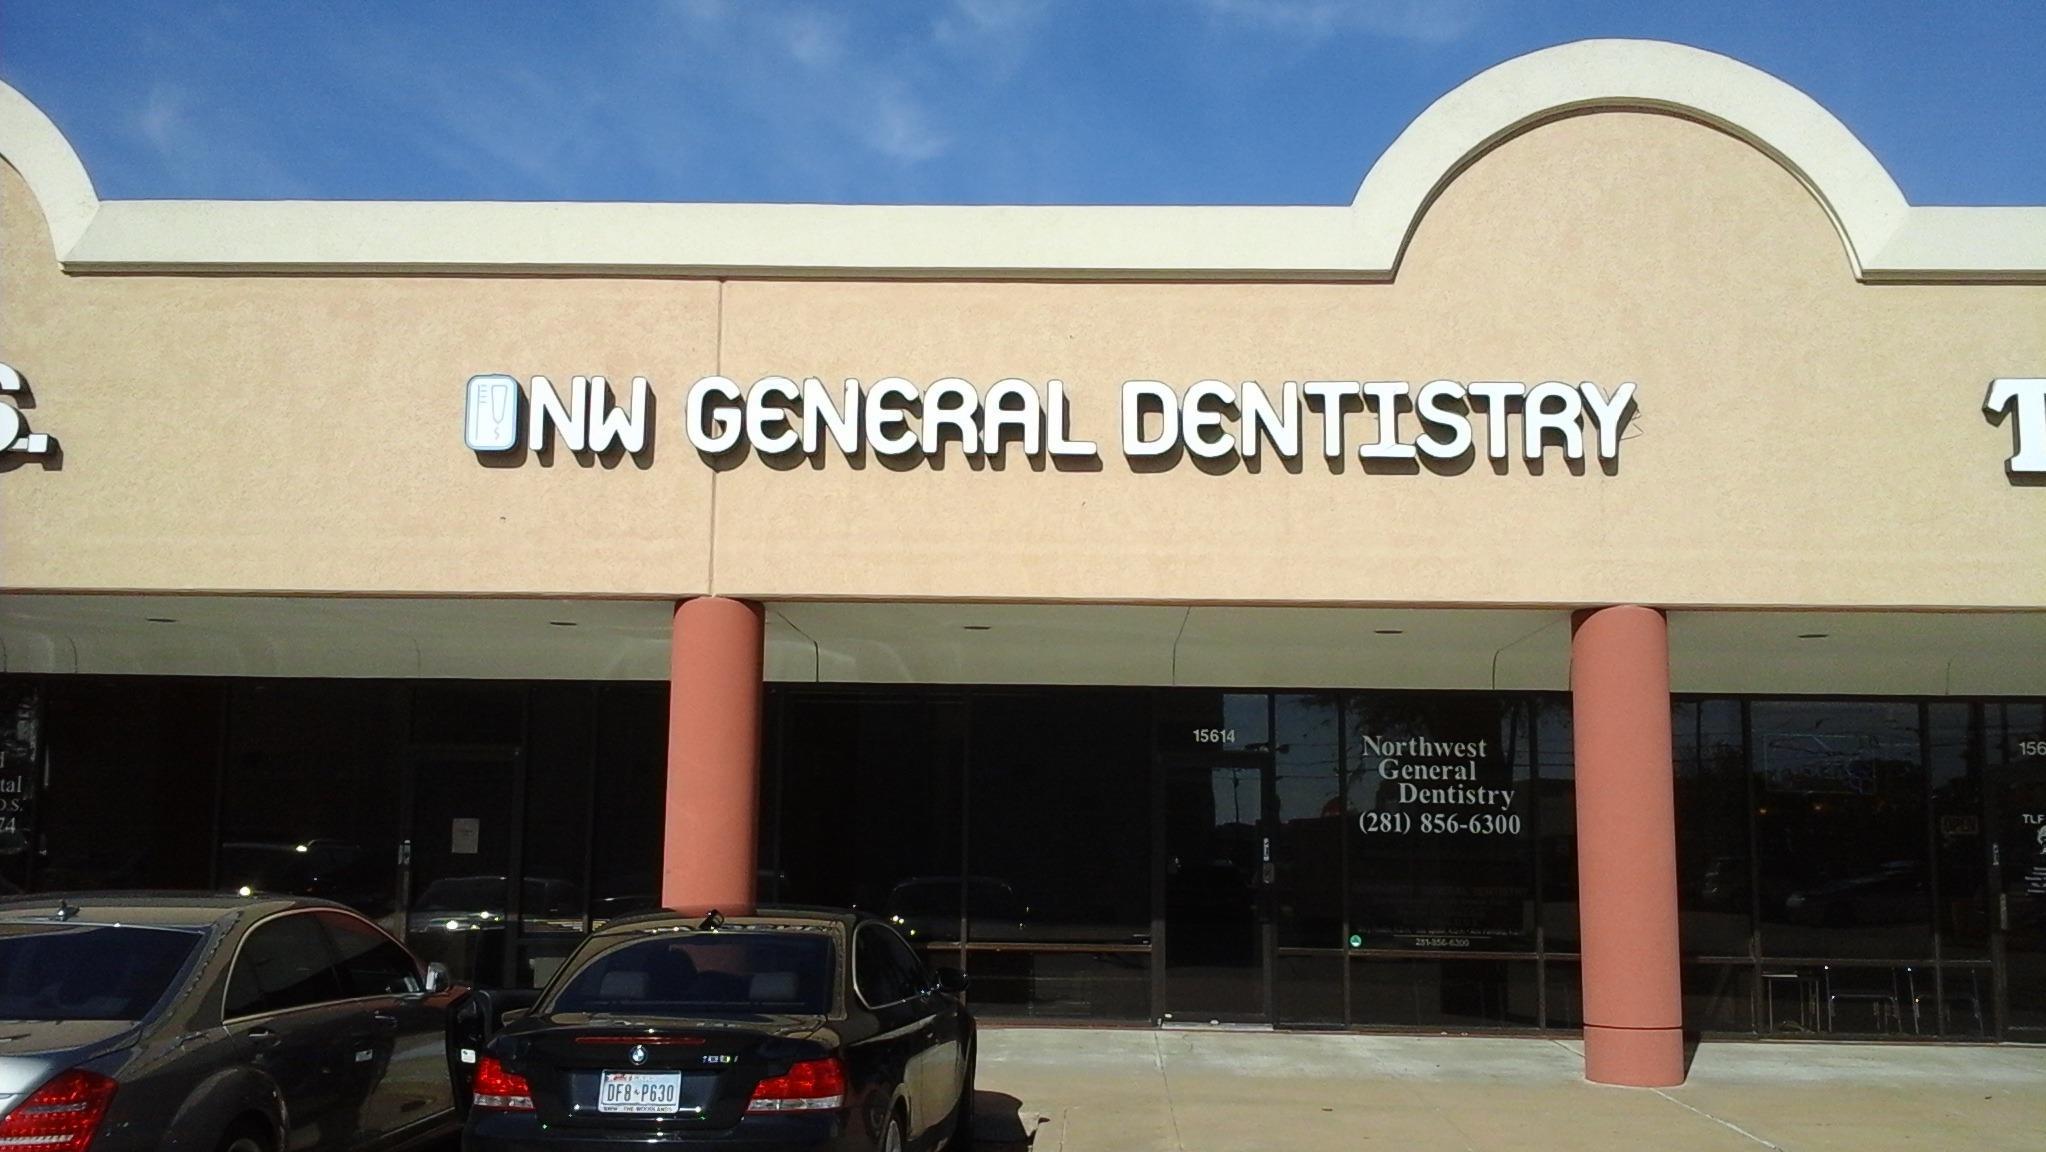 Northwest General Dentistry image 3